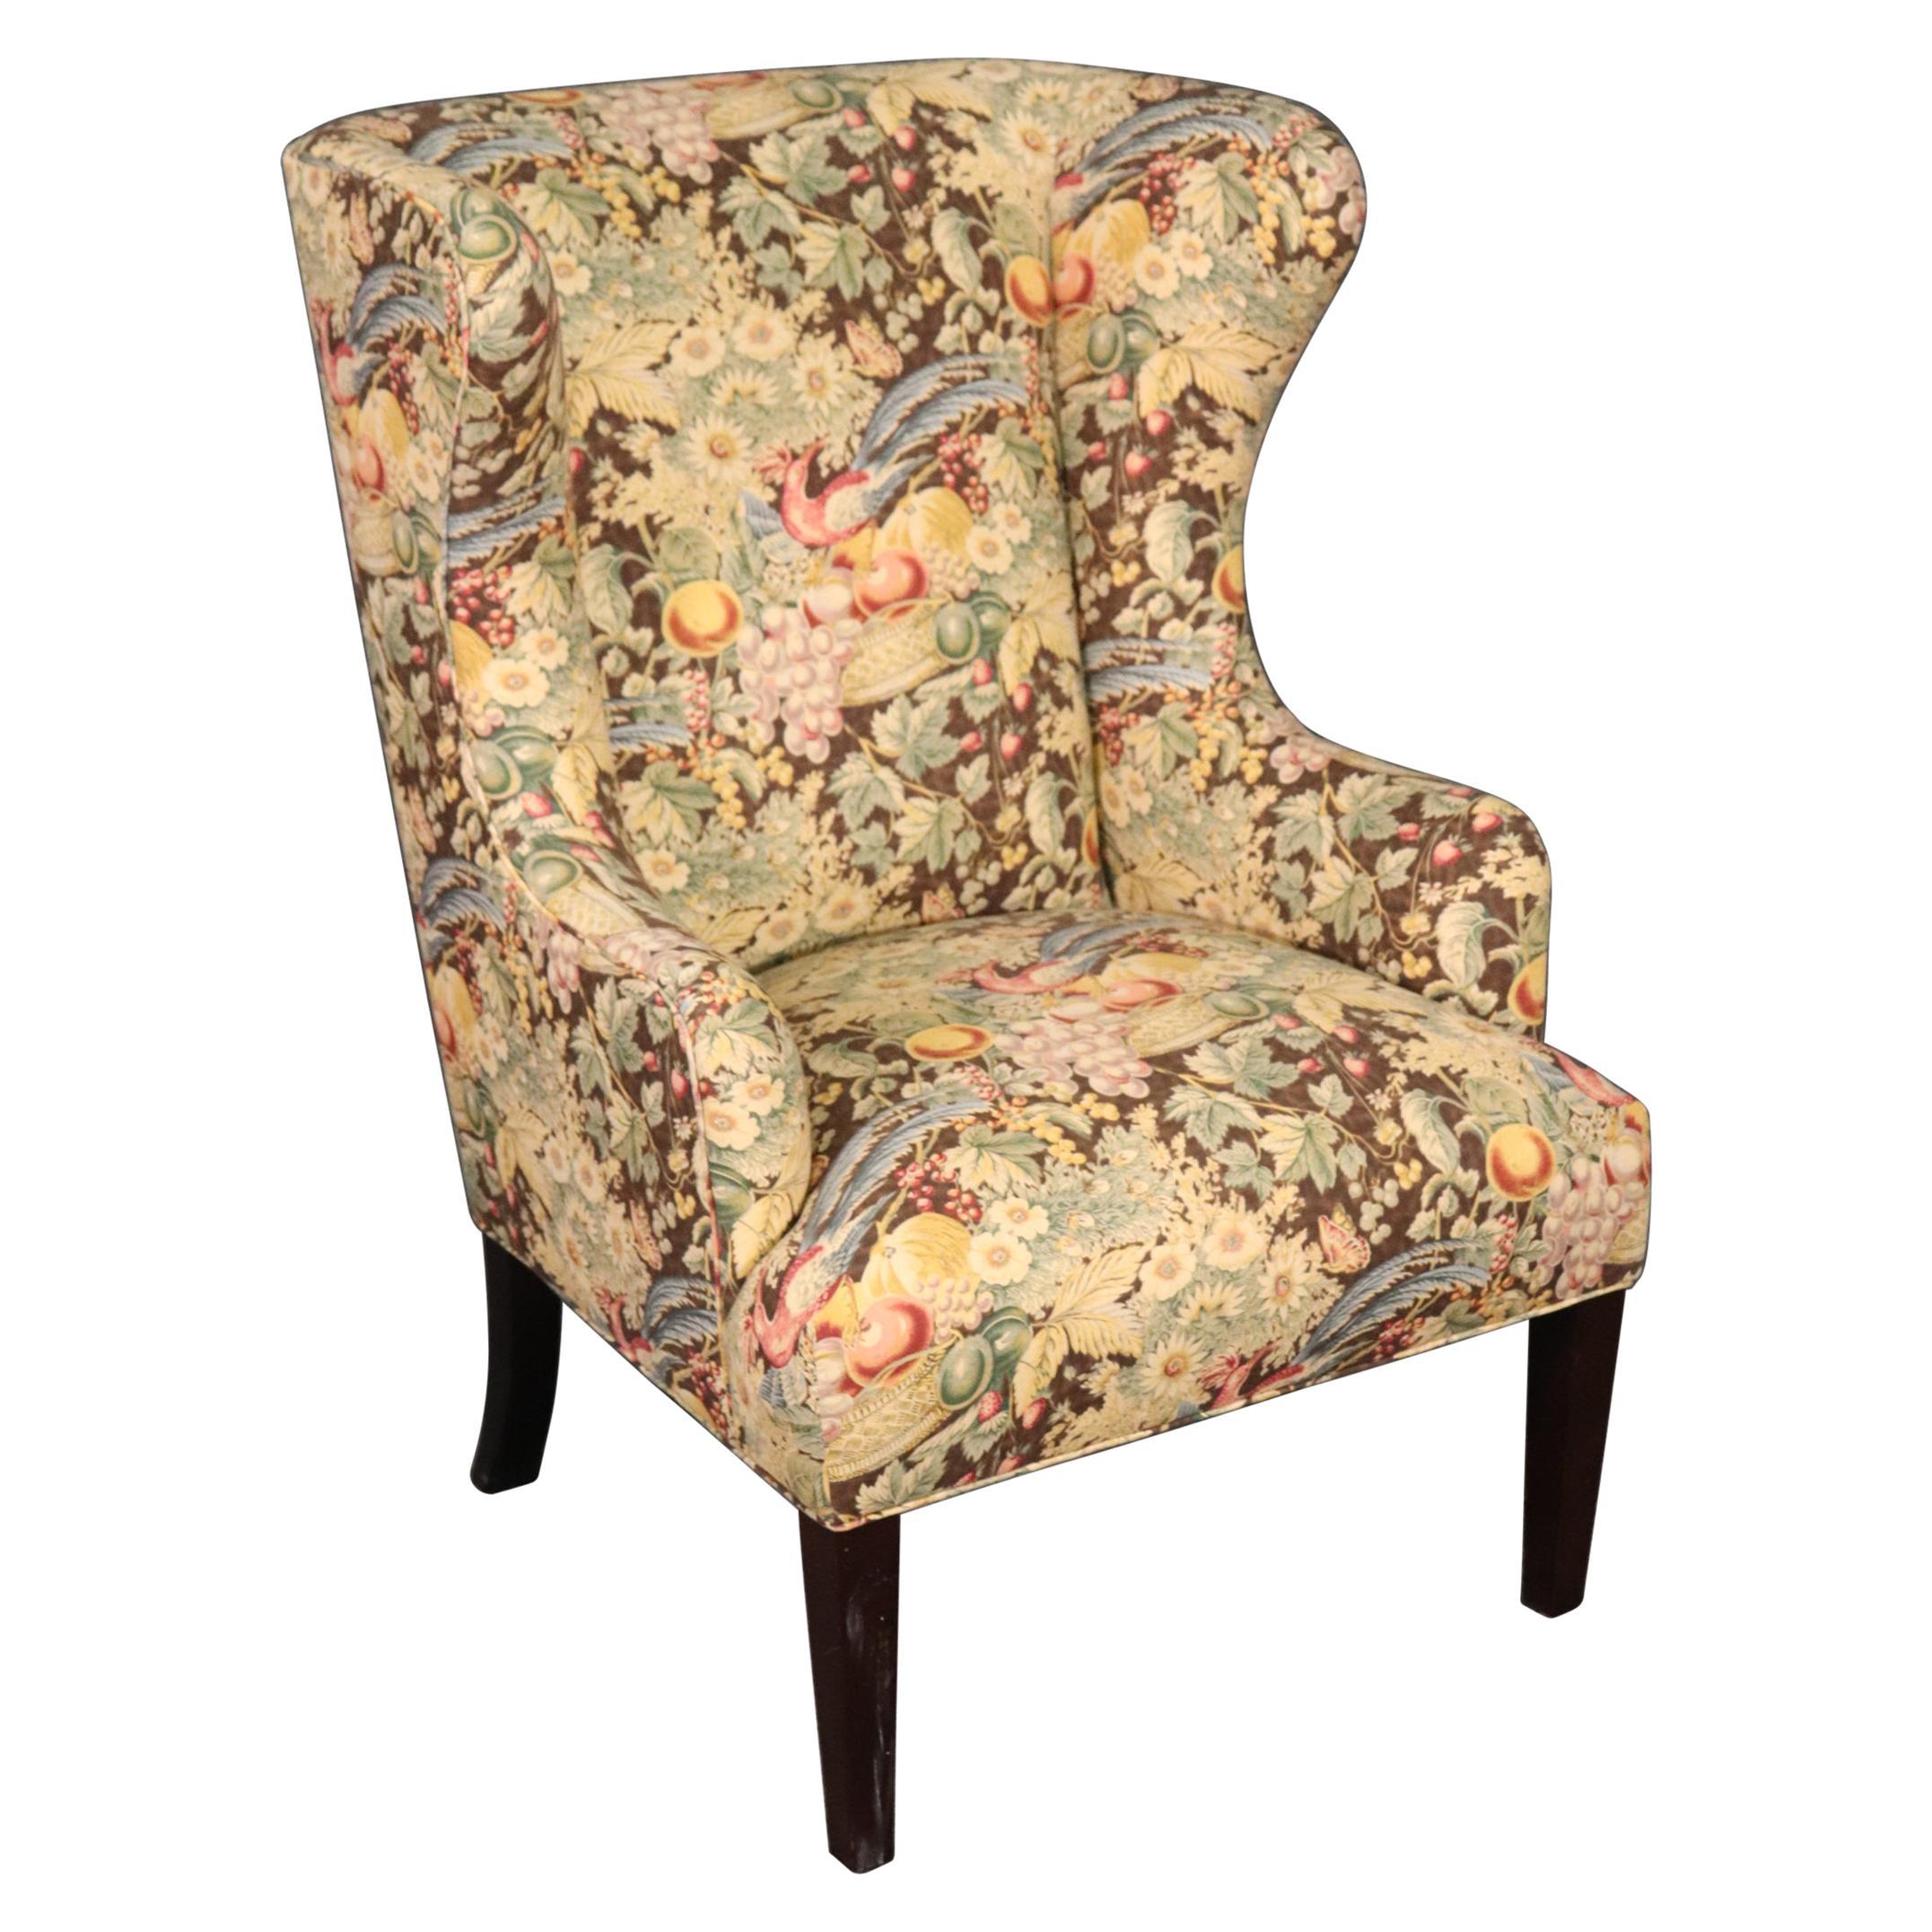 Baker Furniture Floral Upholstered Wingback or Fireside Chair